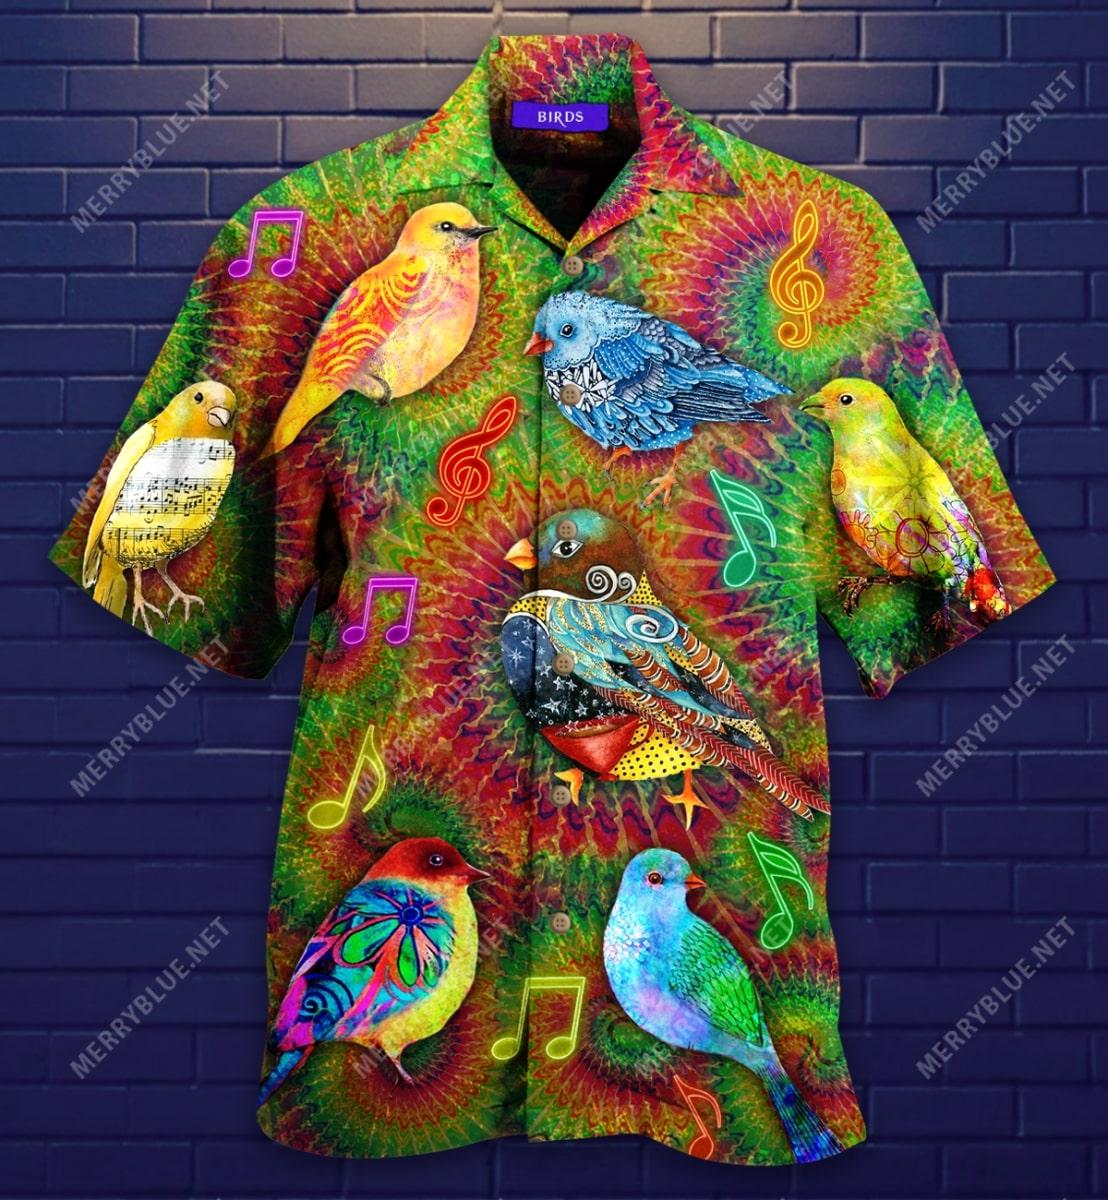 groovy birdy colorful all over printed hawaiian shirt 4